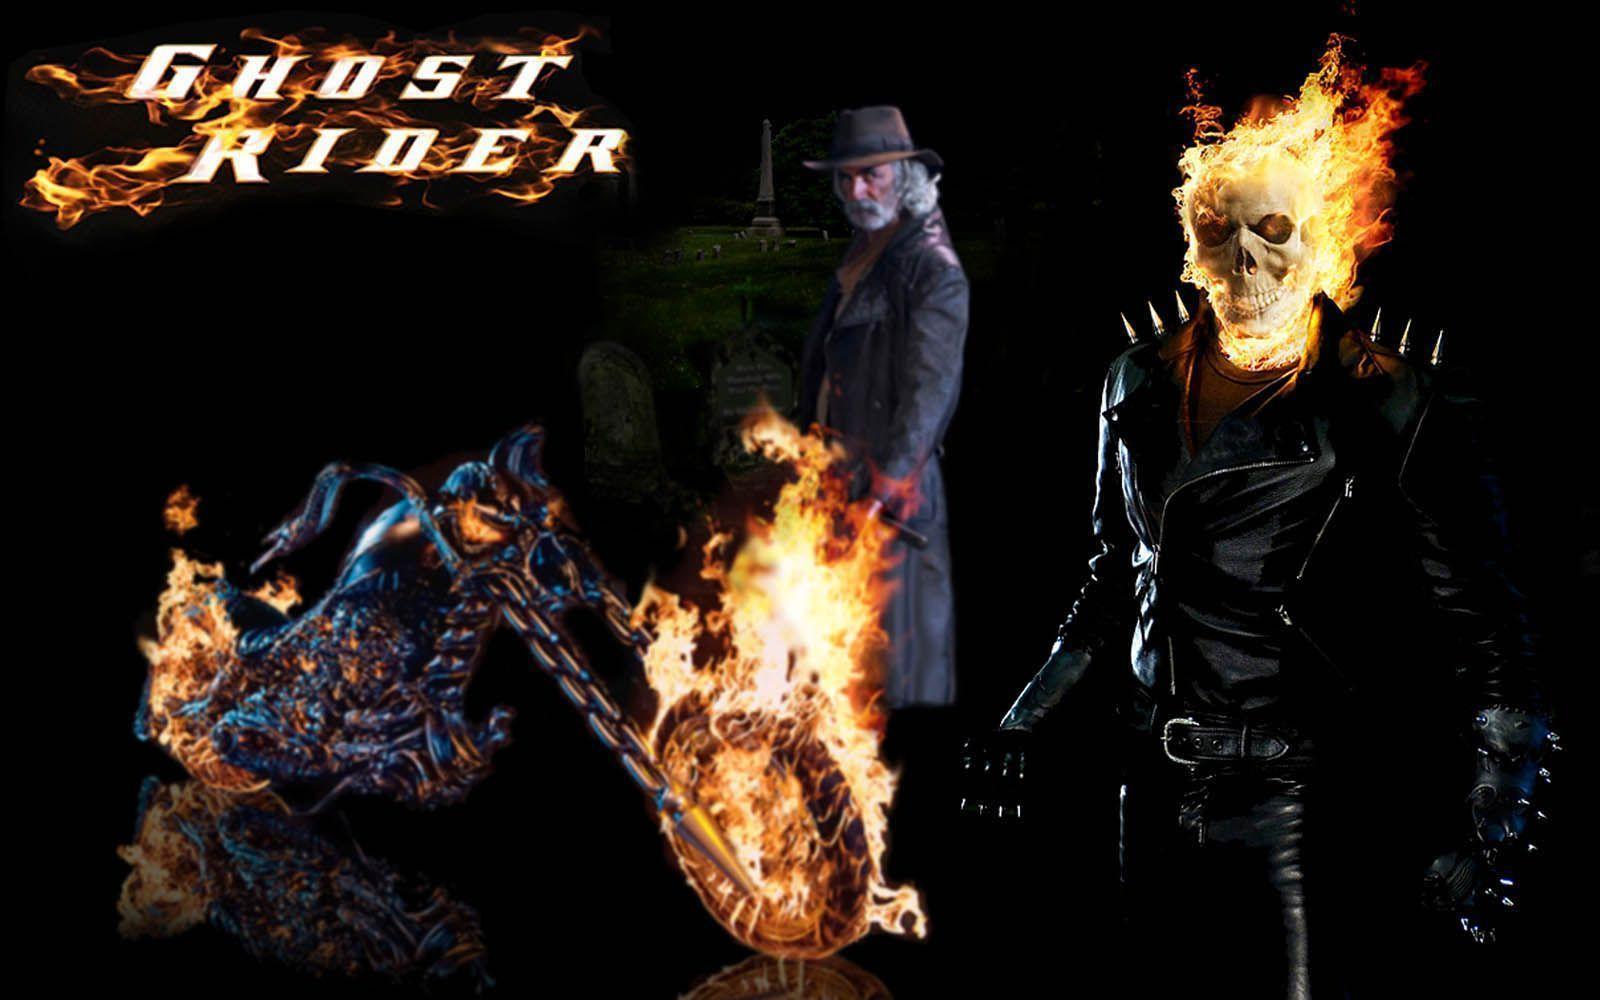 HD Wallpaper Ghost Rider Bergerak wallpaper prambanan